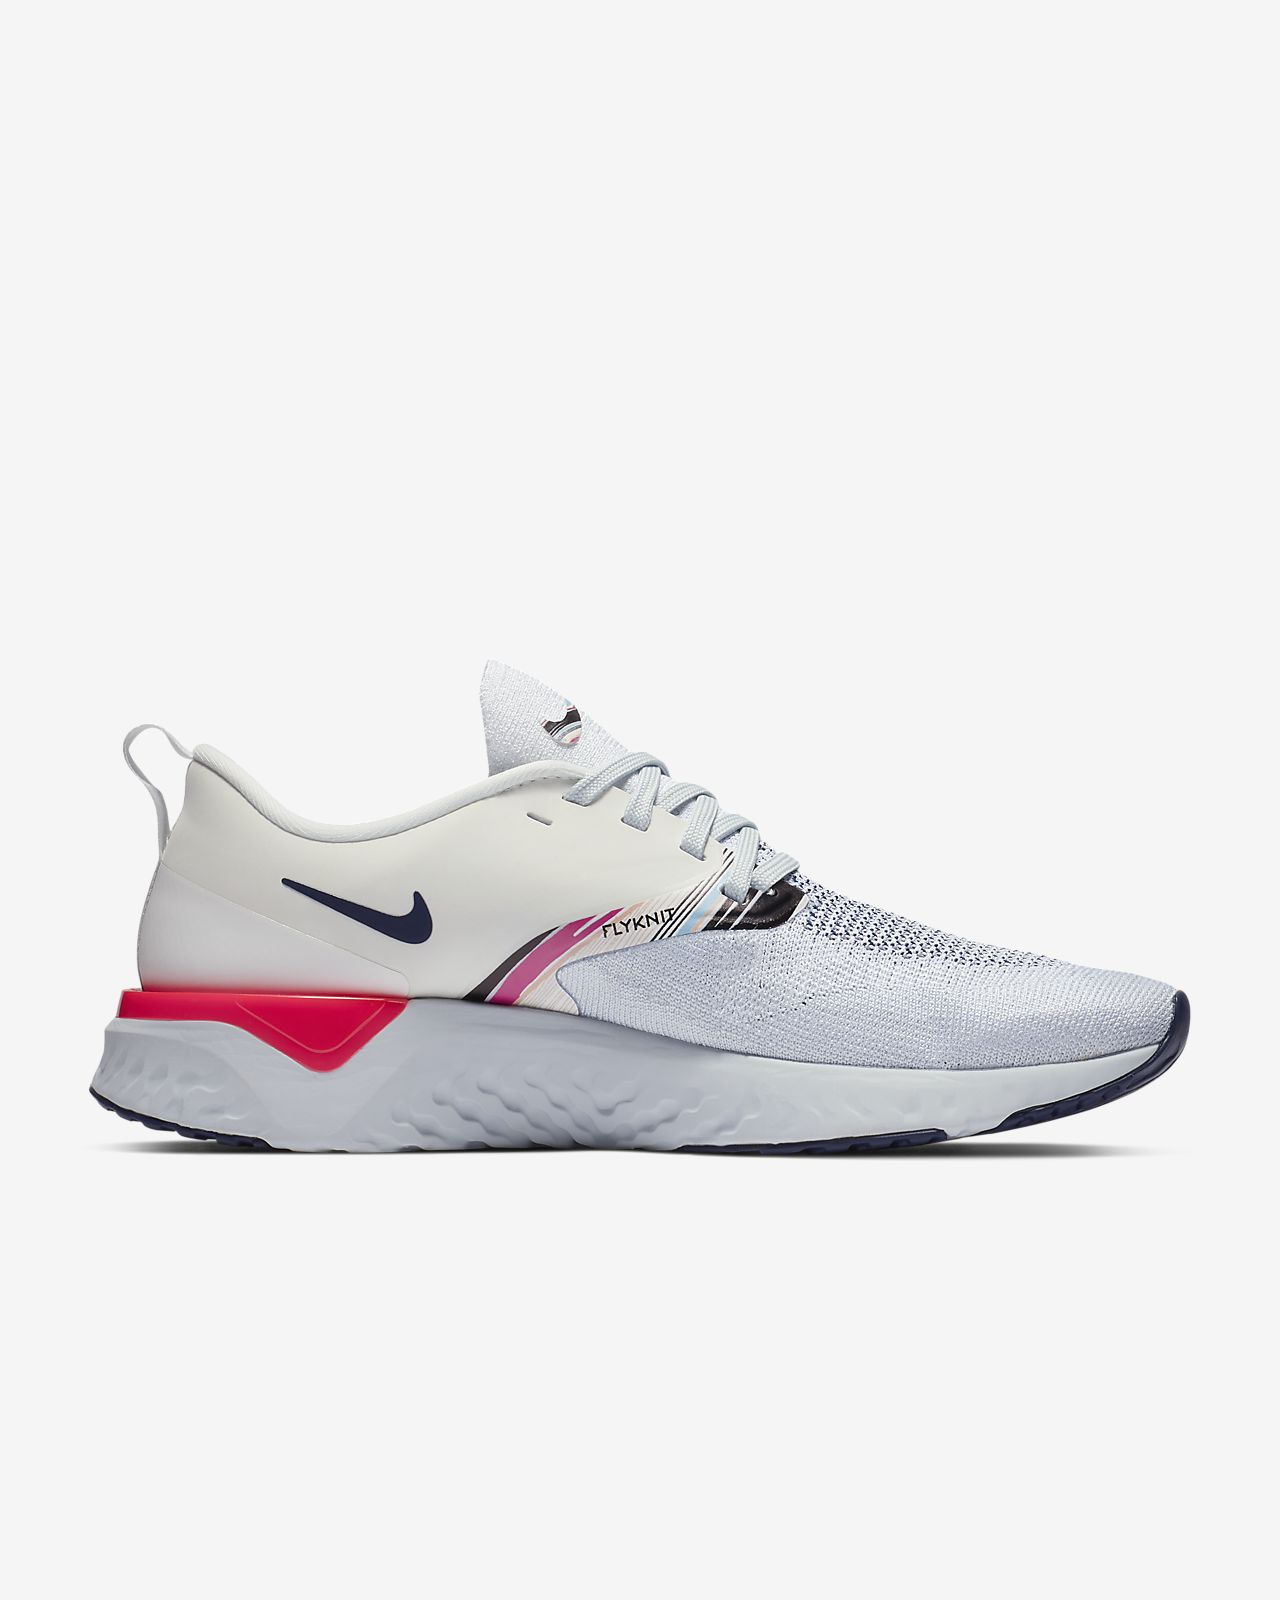 la meilleure attitude a6368 7ecdf Chaussure de running Nike Odyssey React Flyknit 2 Premium pour Femme